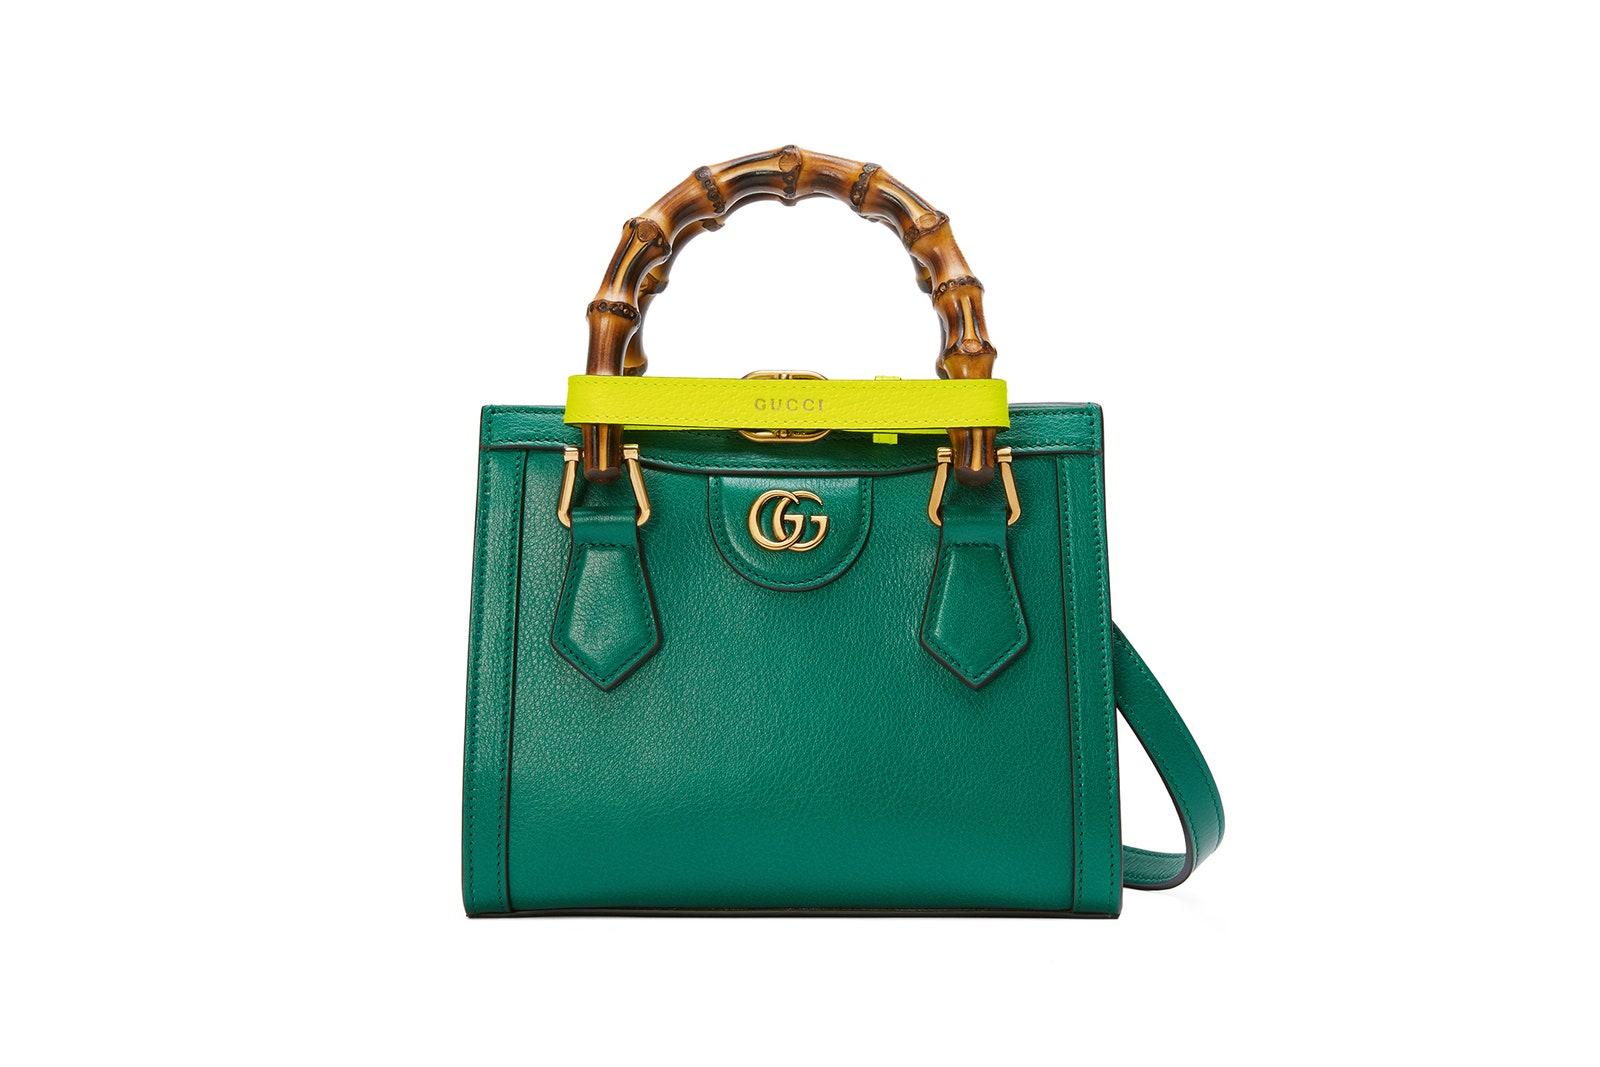 Gucci Diana: Gucci relaunch its classic Princess Diana bag